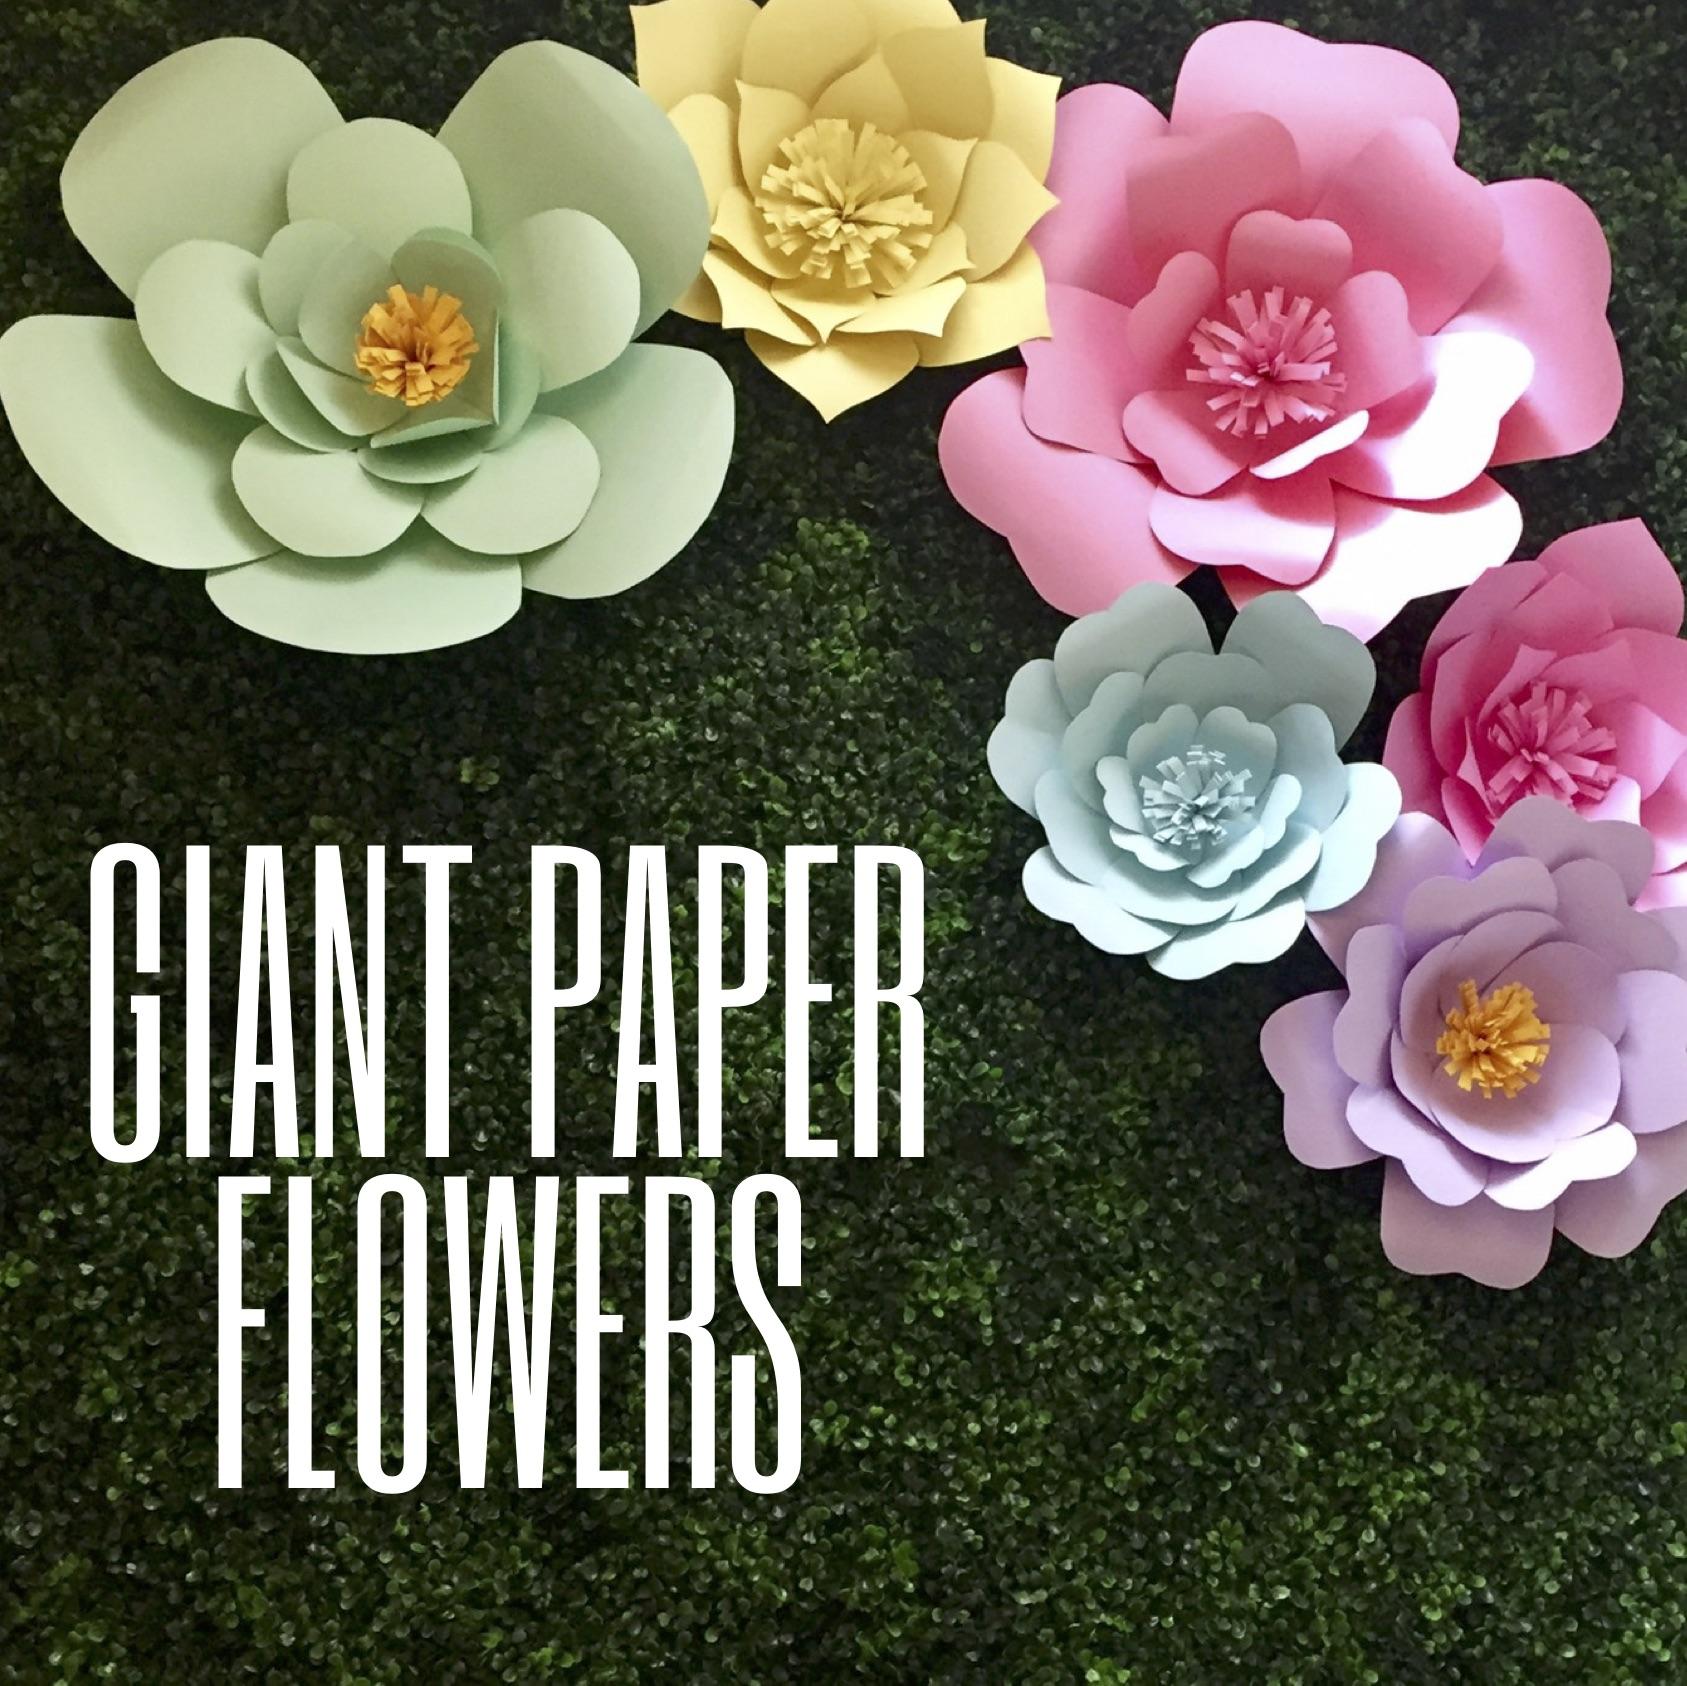 Giant paper flowers copy.jpg